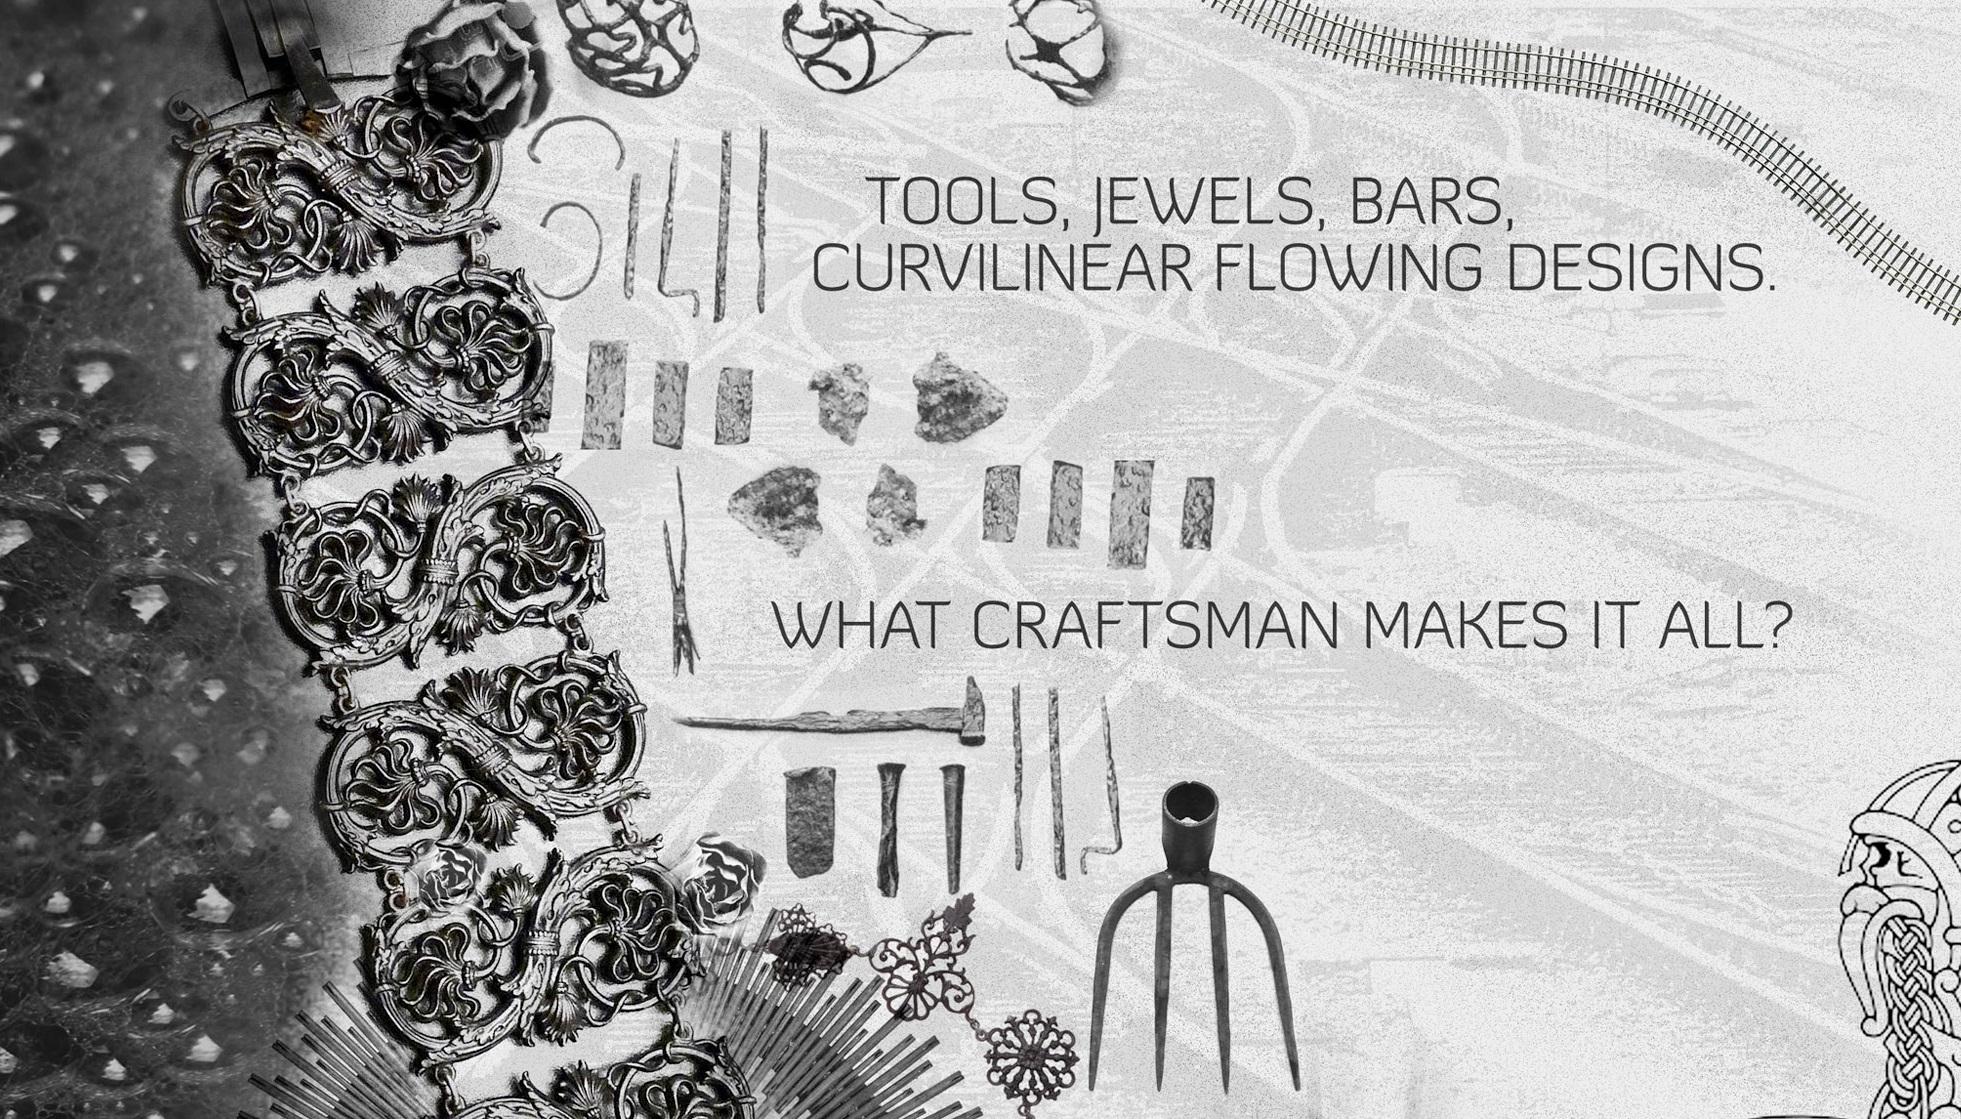 fiction_tools jewels